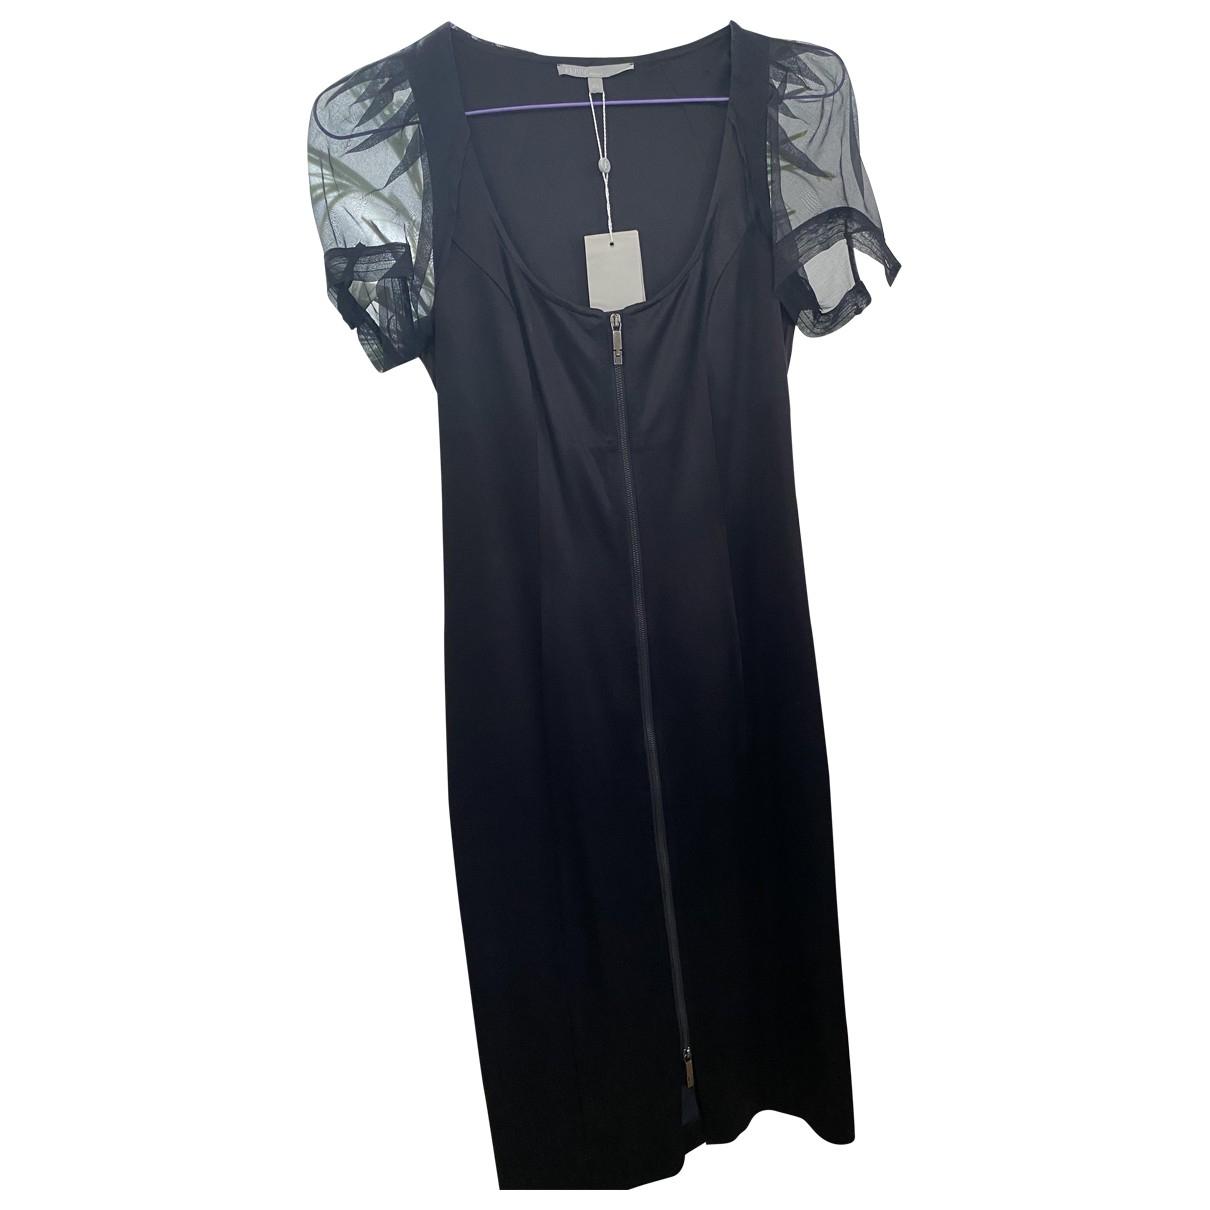 Gianfranco Ferré \N Black dress for Women 10 UK